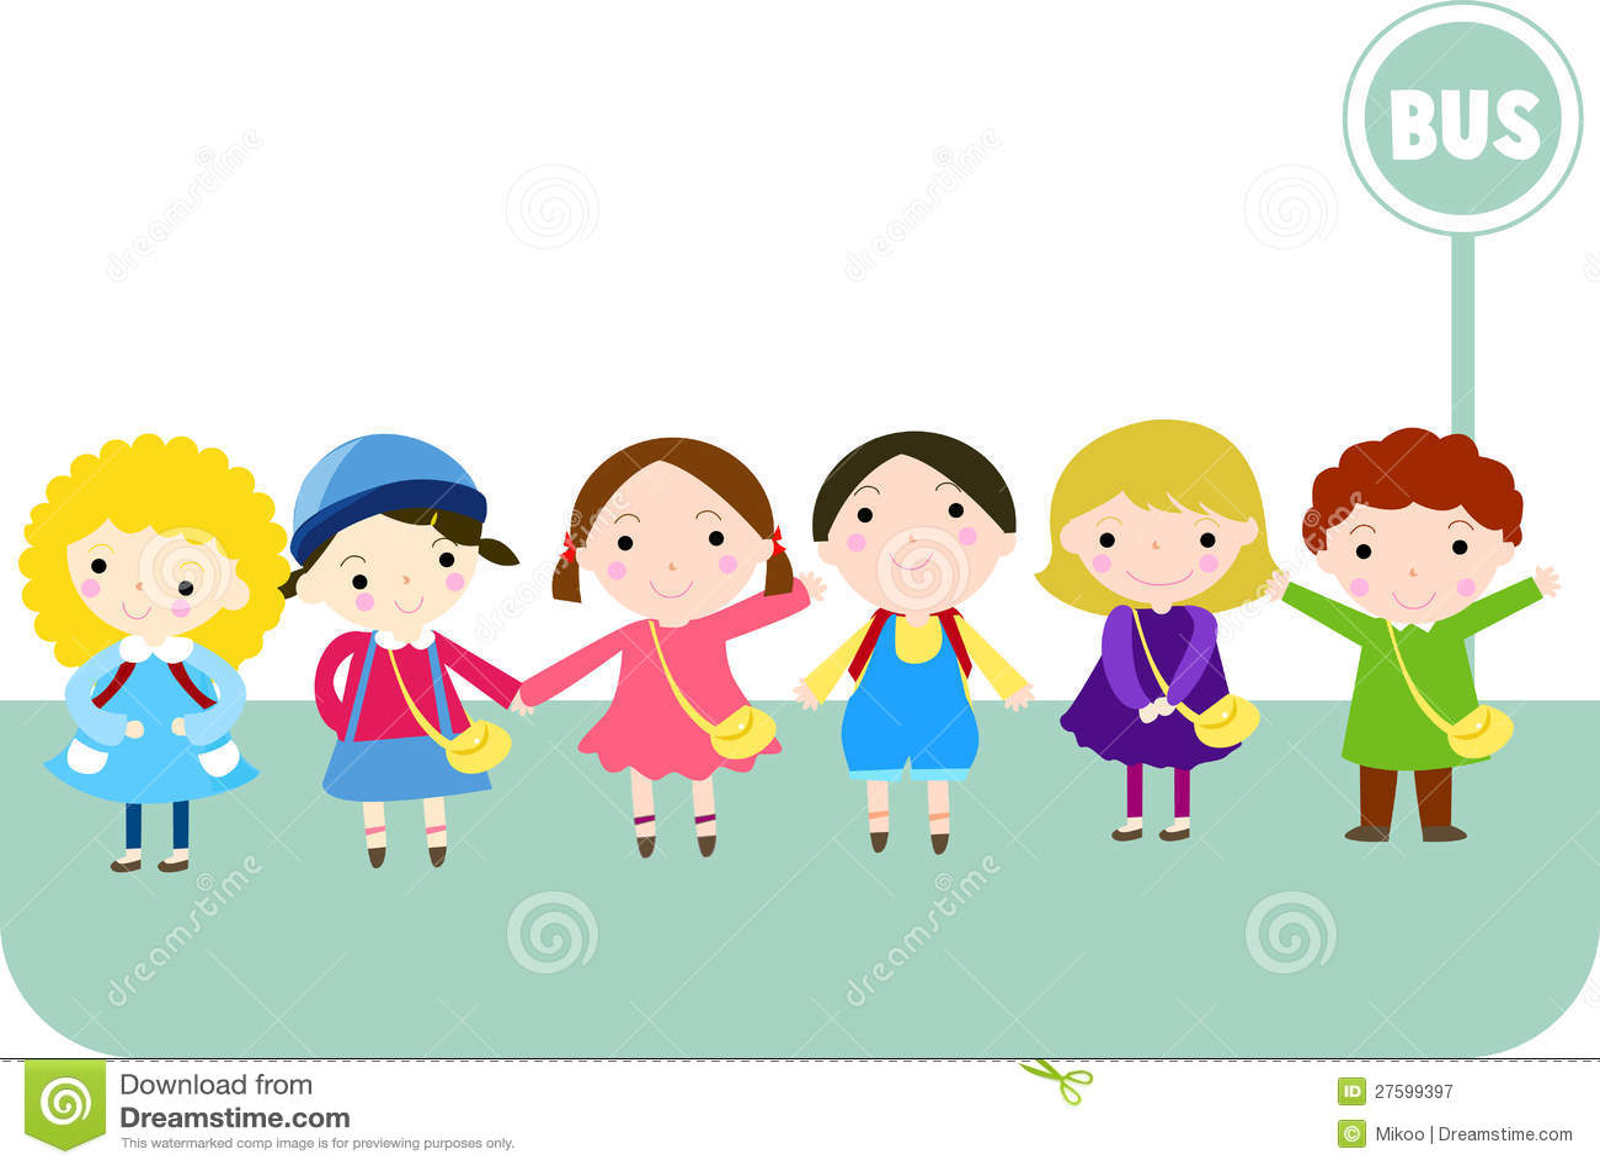 Children Waiting Bus Stock Illustrations – 77 Children ...